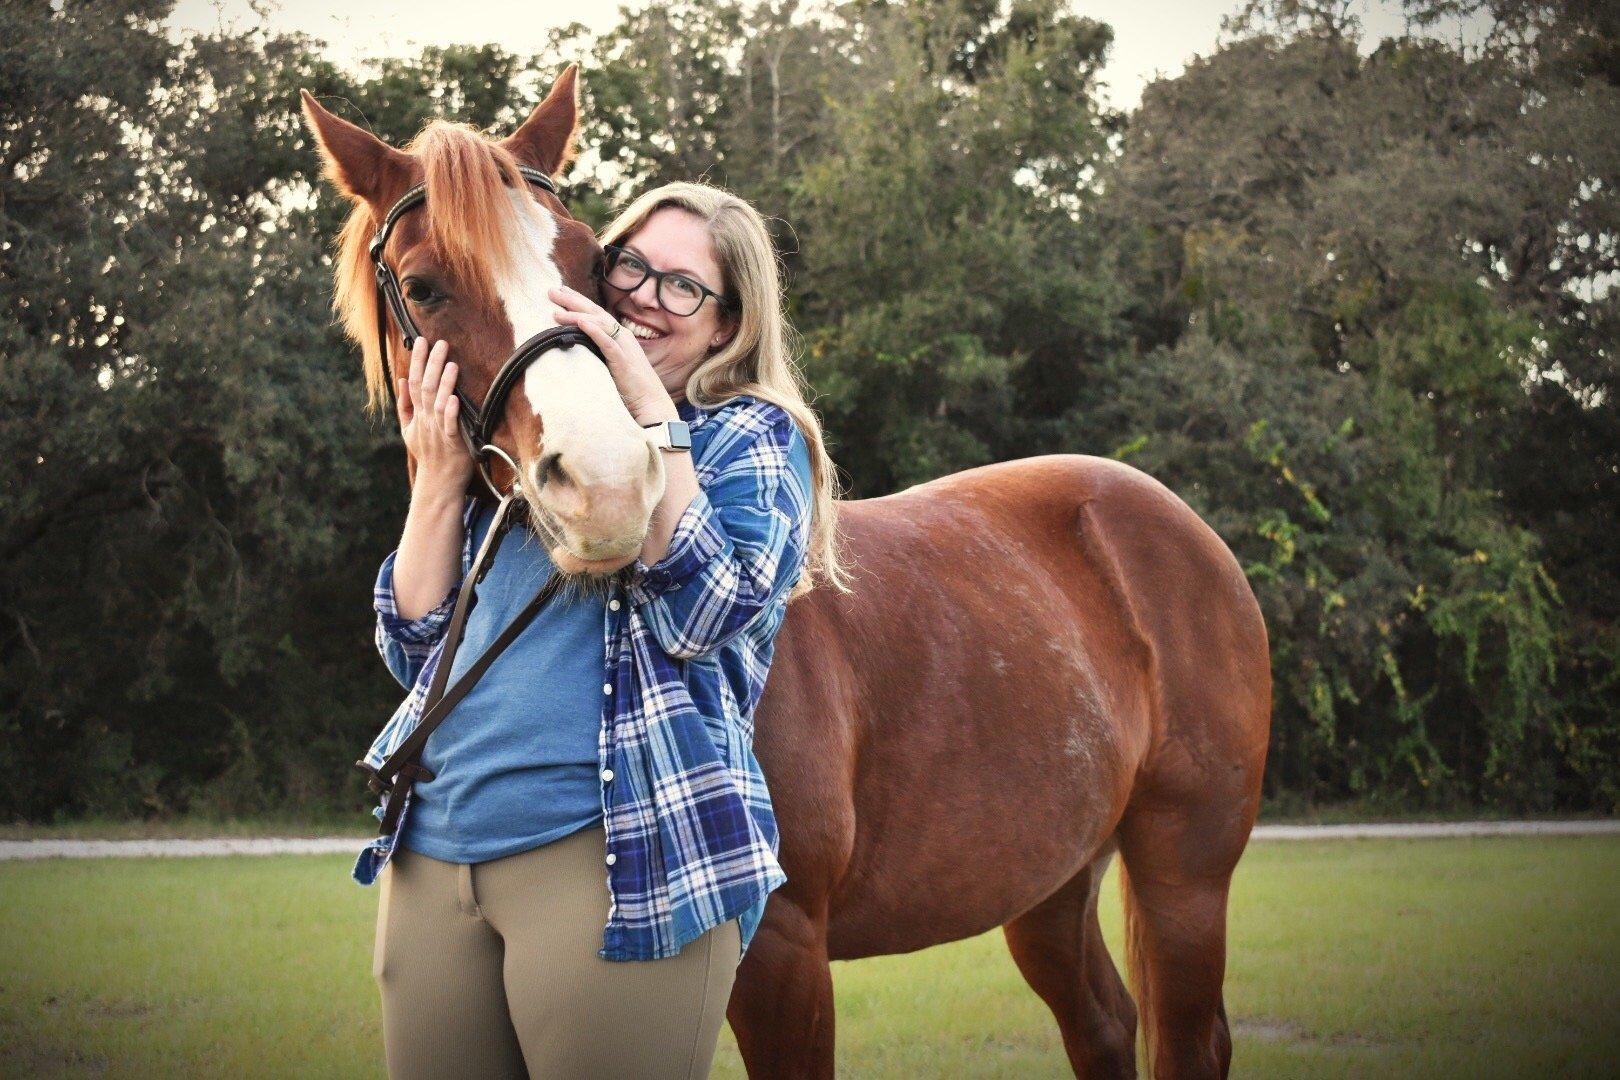 Natalie Keller Reinert and her horse Ben